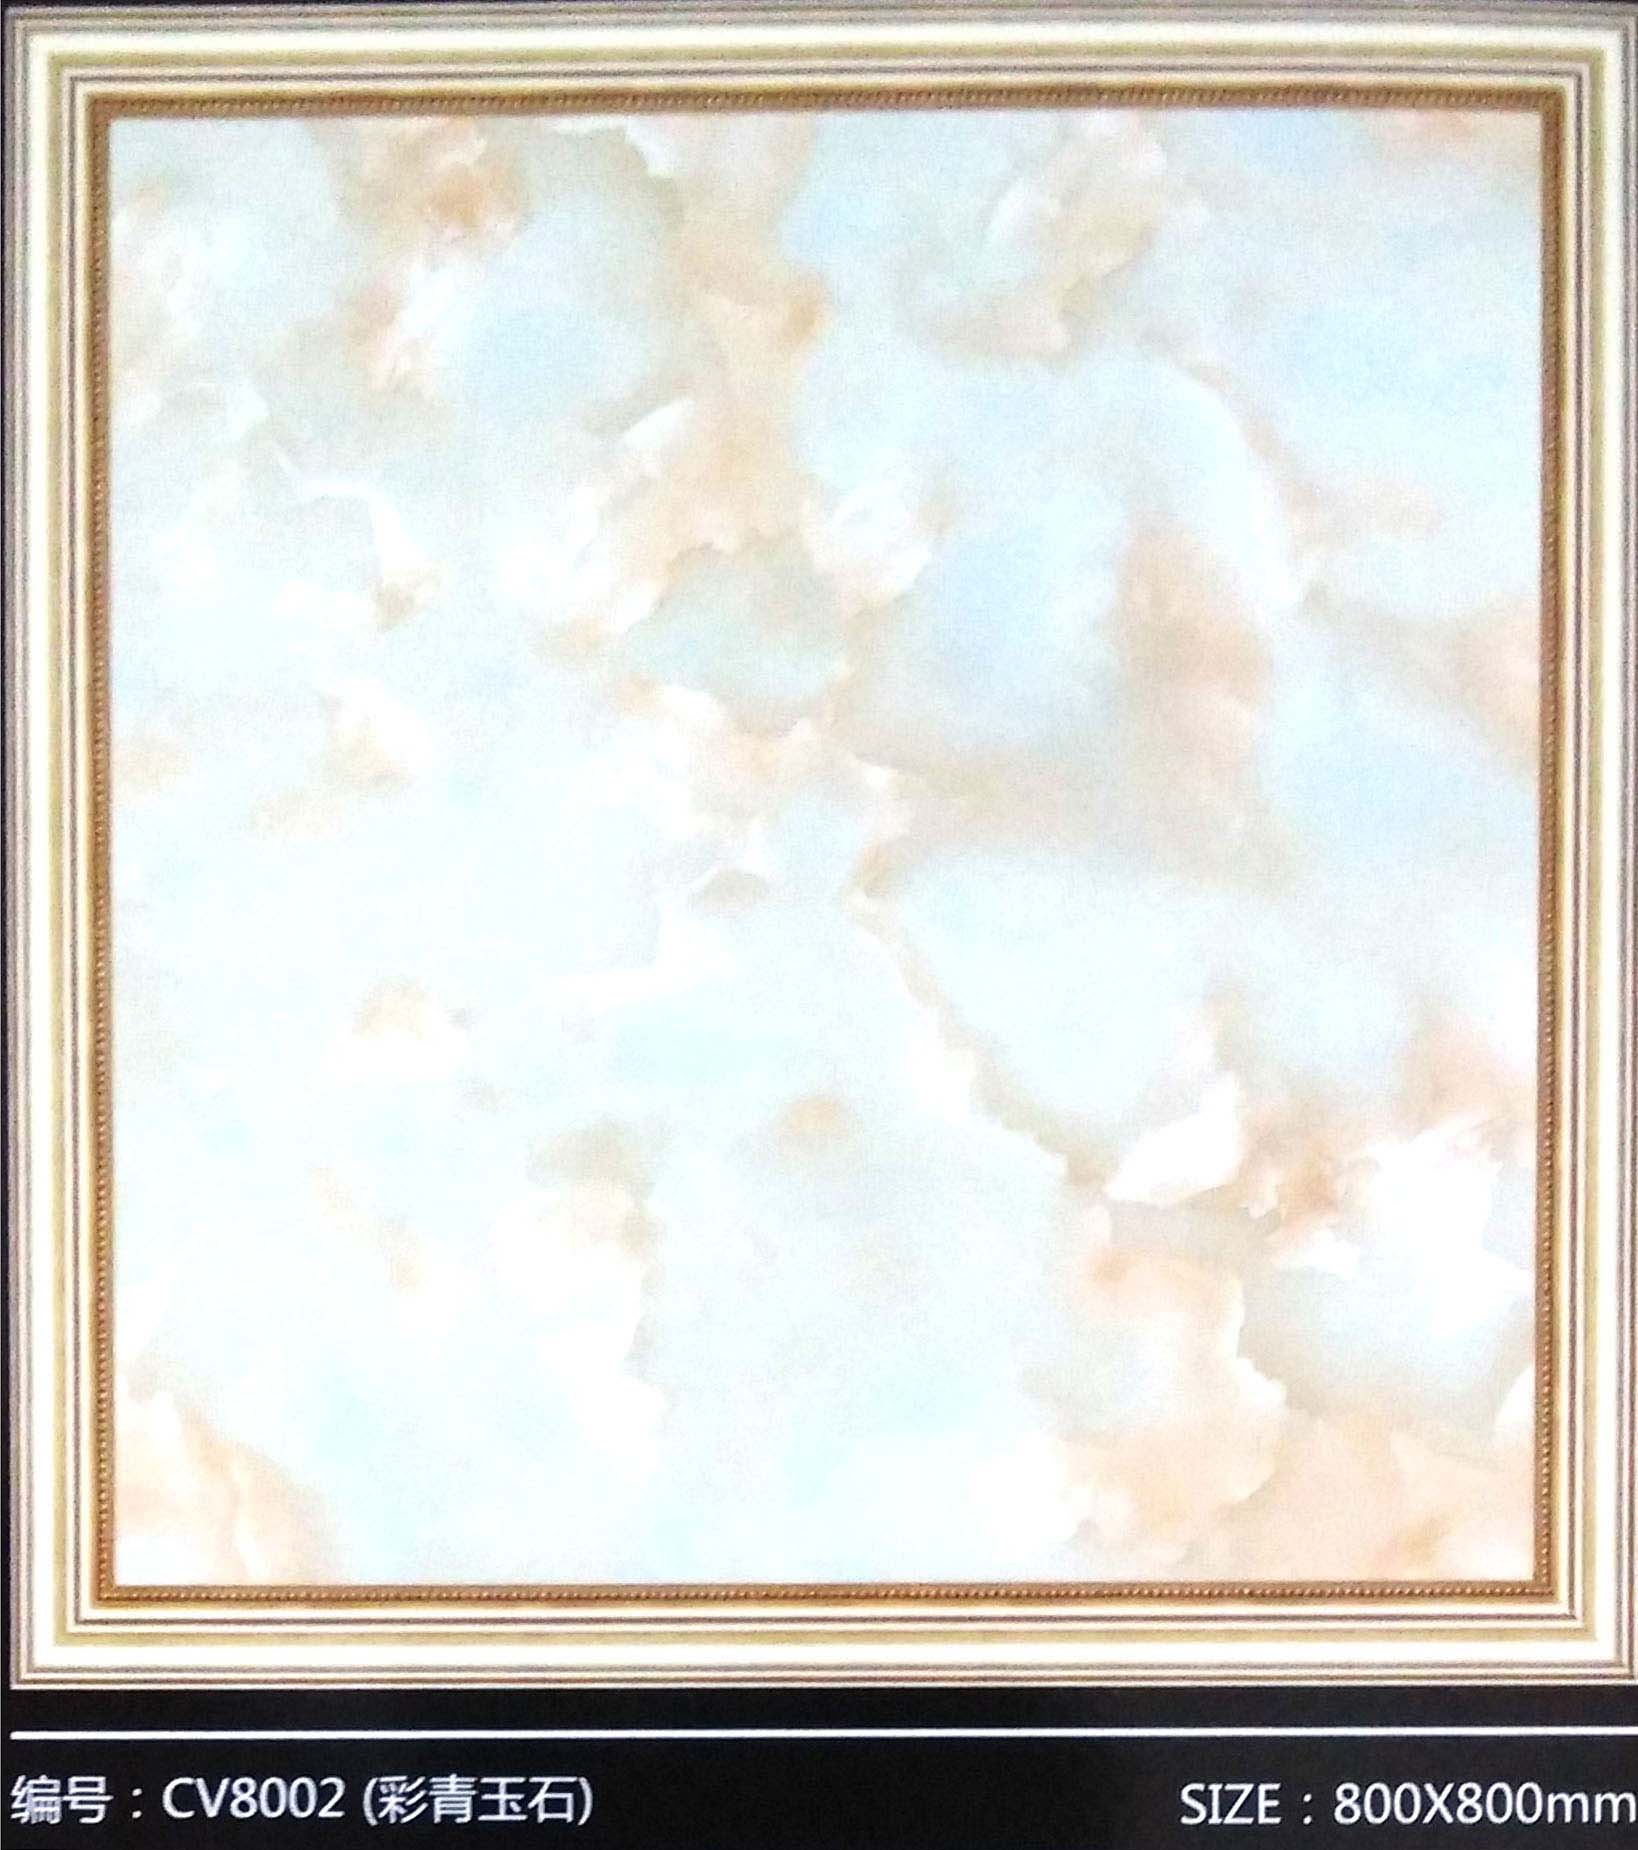 ppt 背景 背景图片 边框 模板 设计 相框 1638_1850